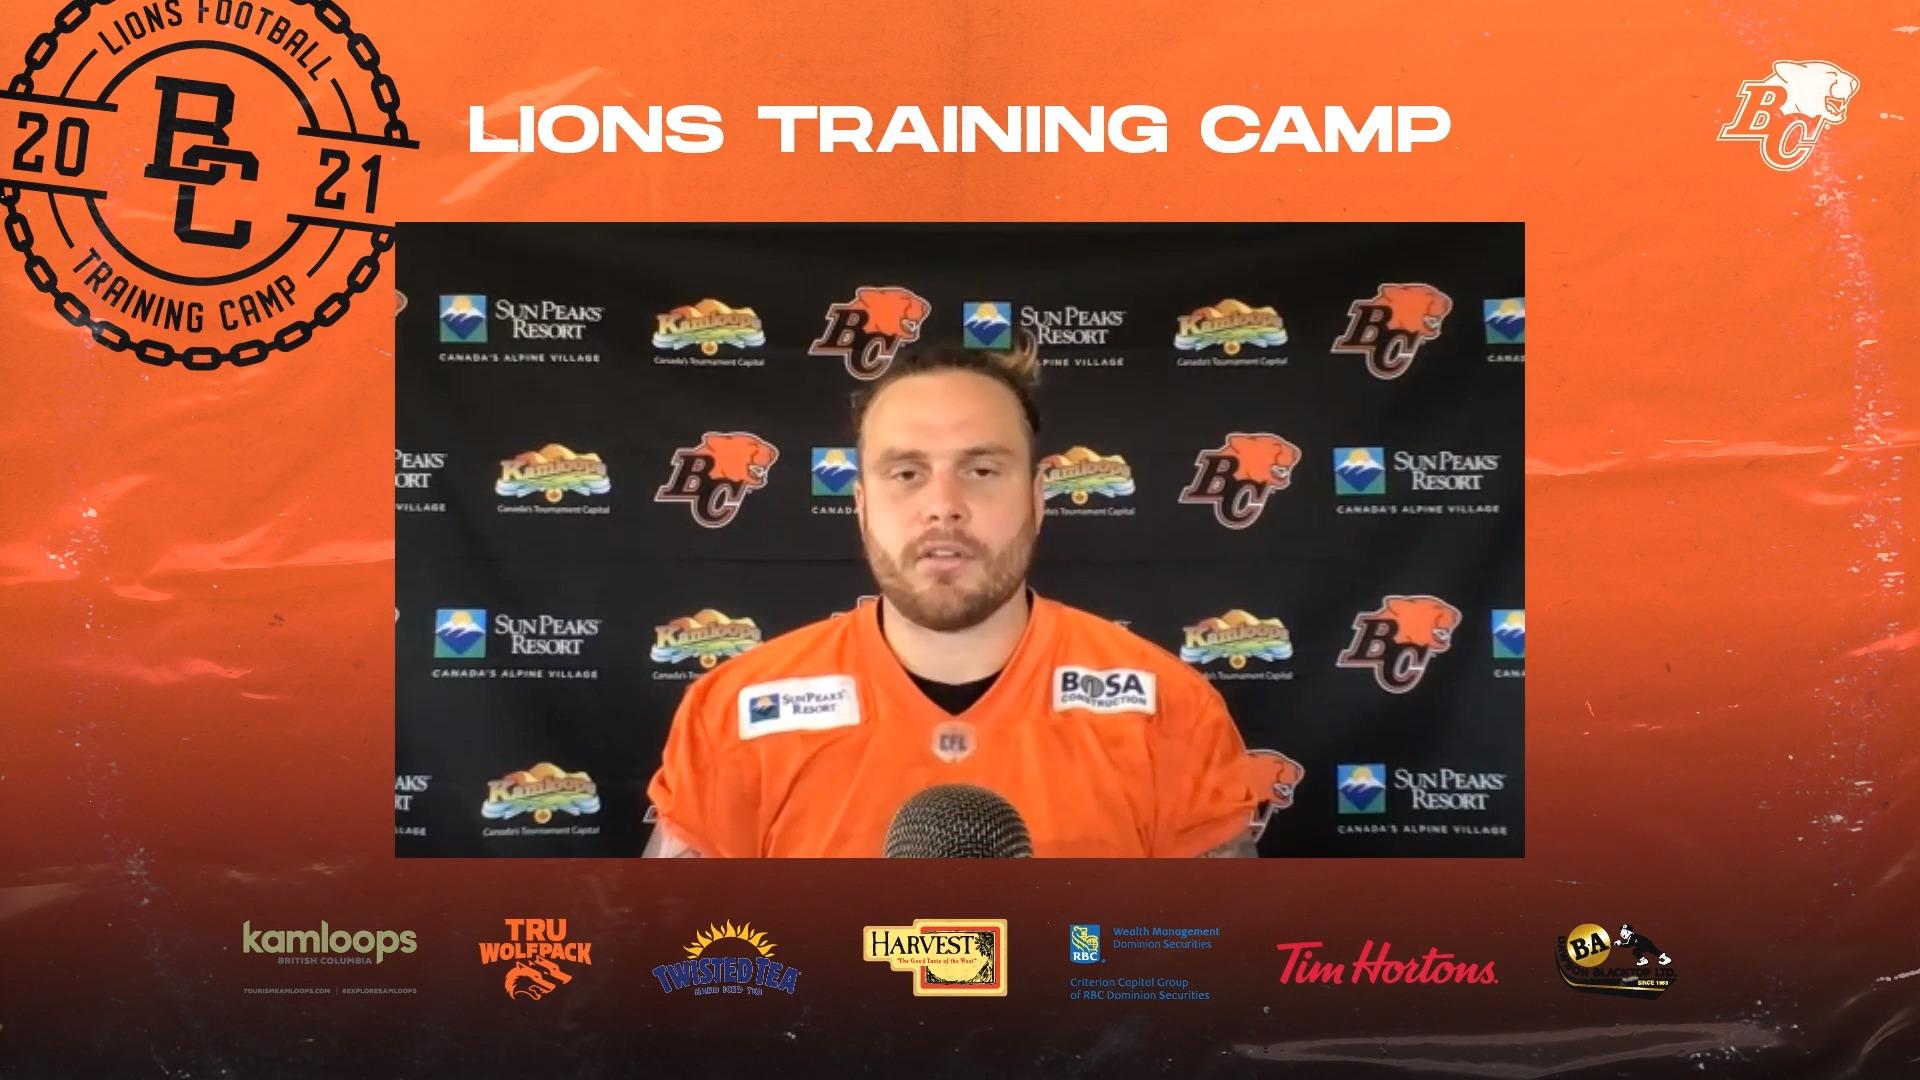 Training Camp July 21 | Hunter Steward